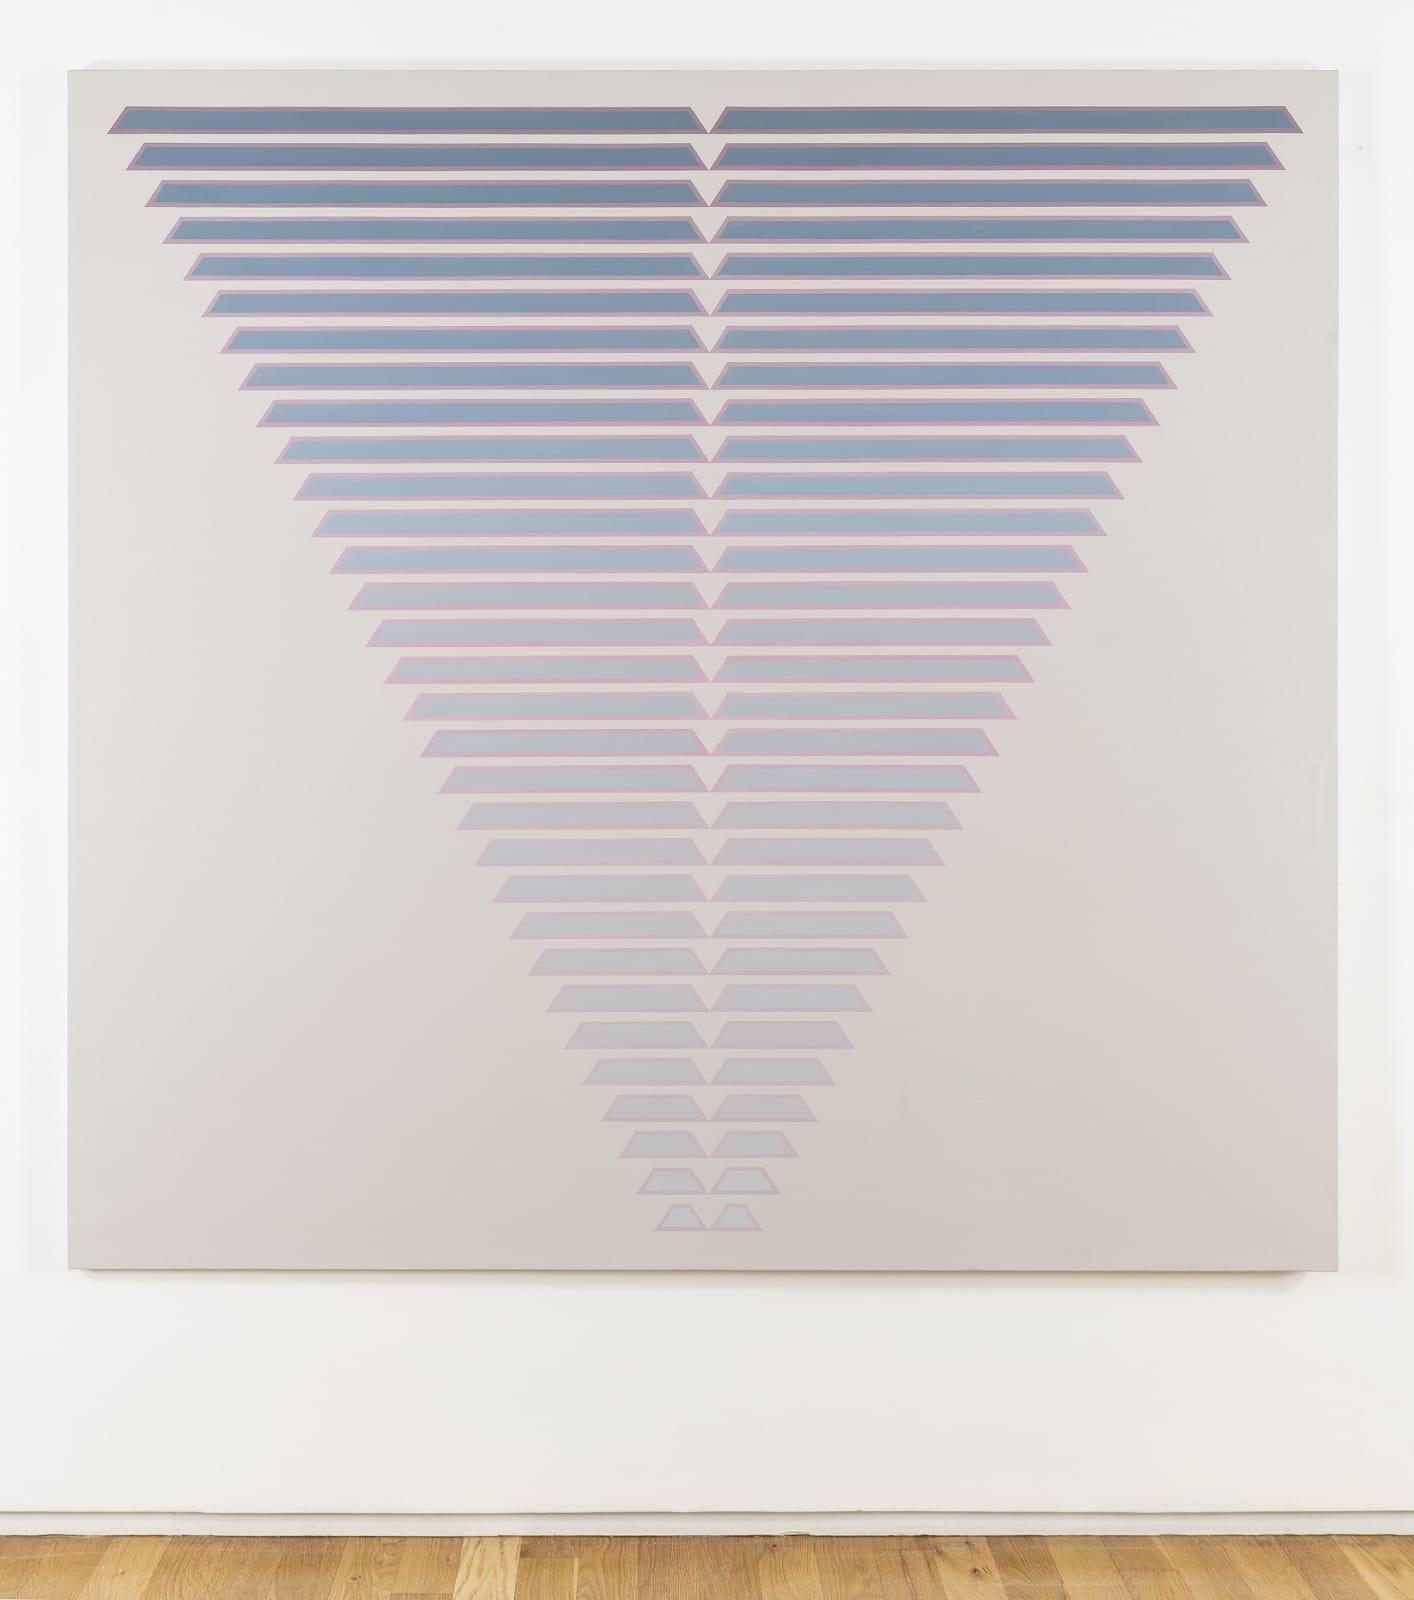 Tess Jaray, Thirty One Steps, 1987